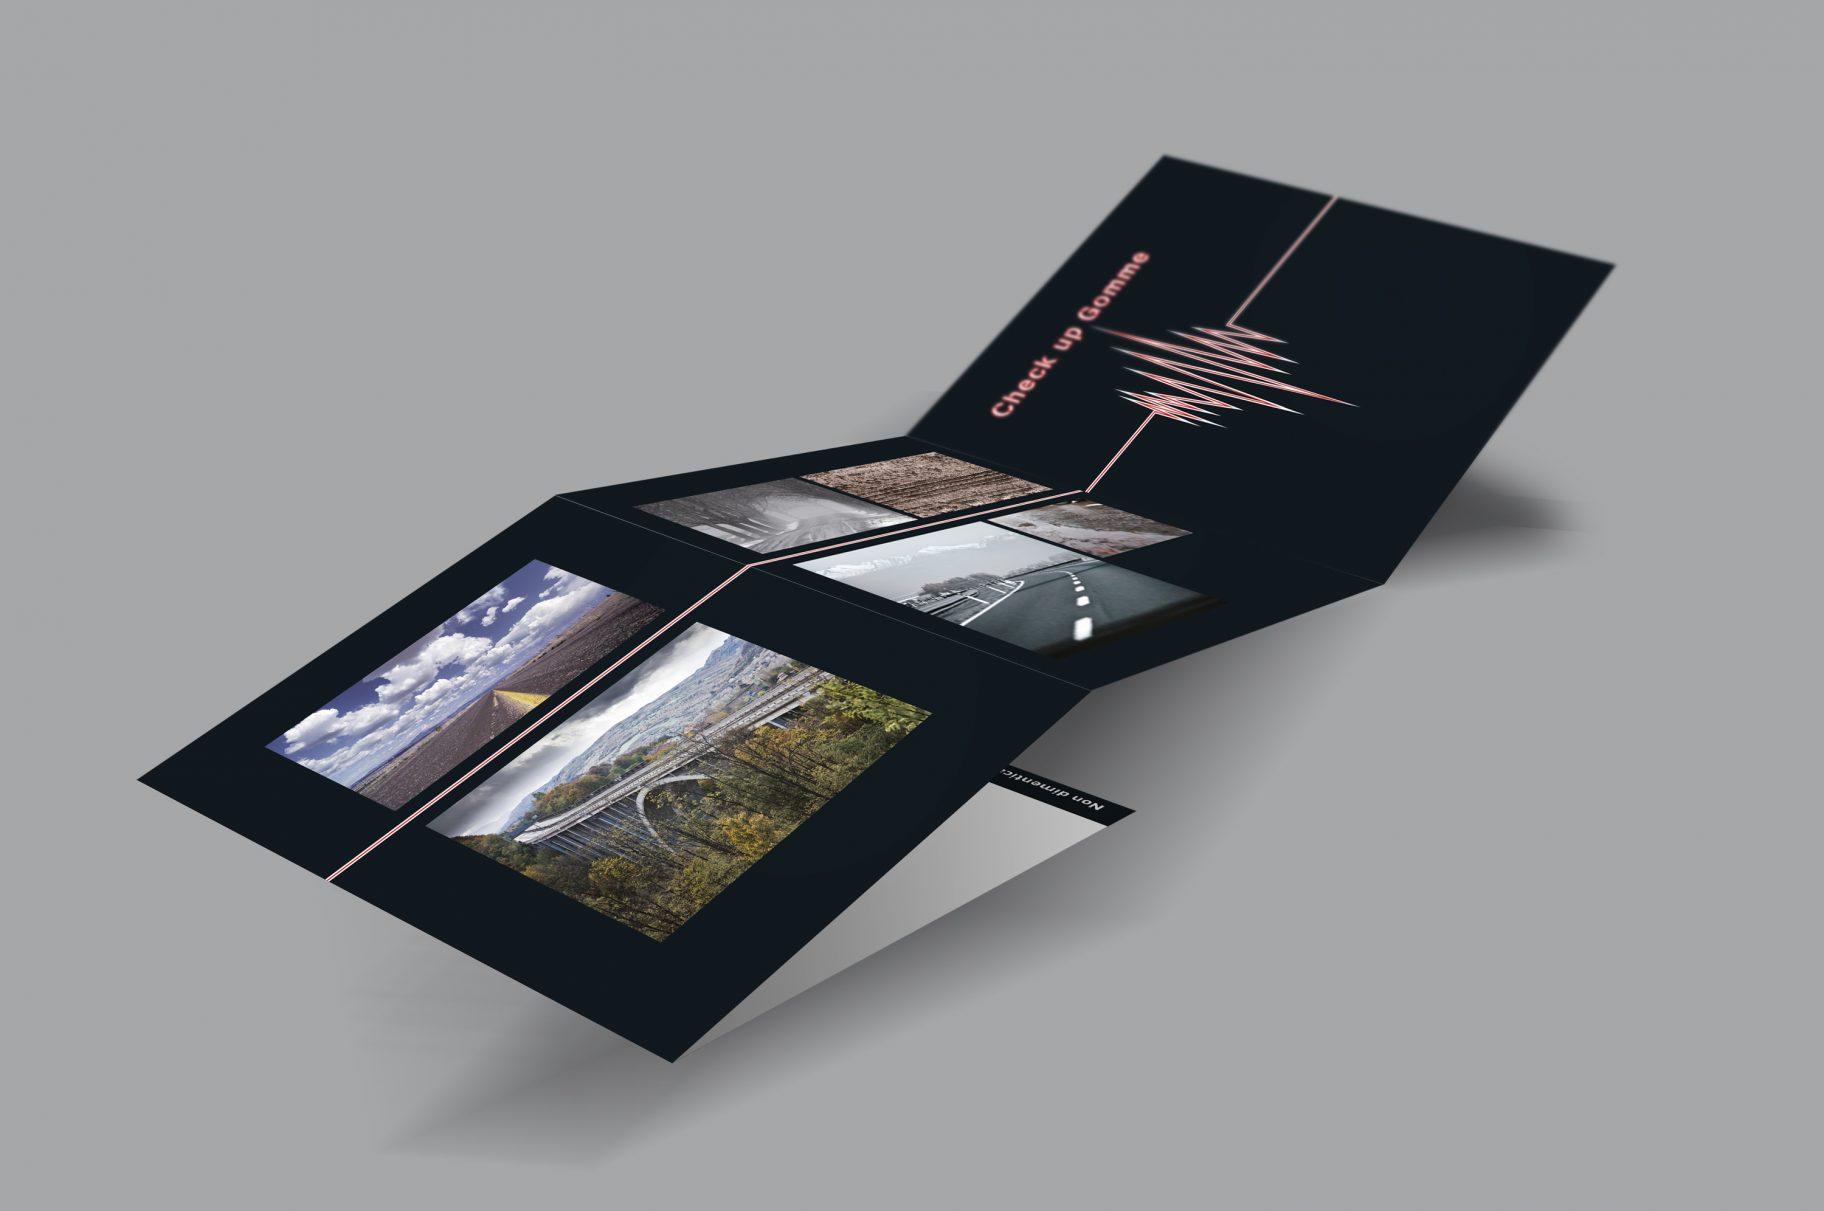 Federpneus-2010-Brochure-Pieghevole-check up gomme-copertina